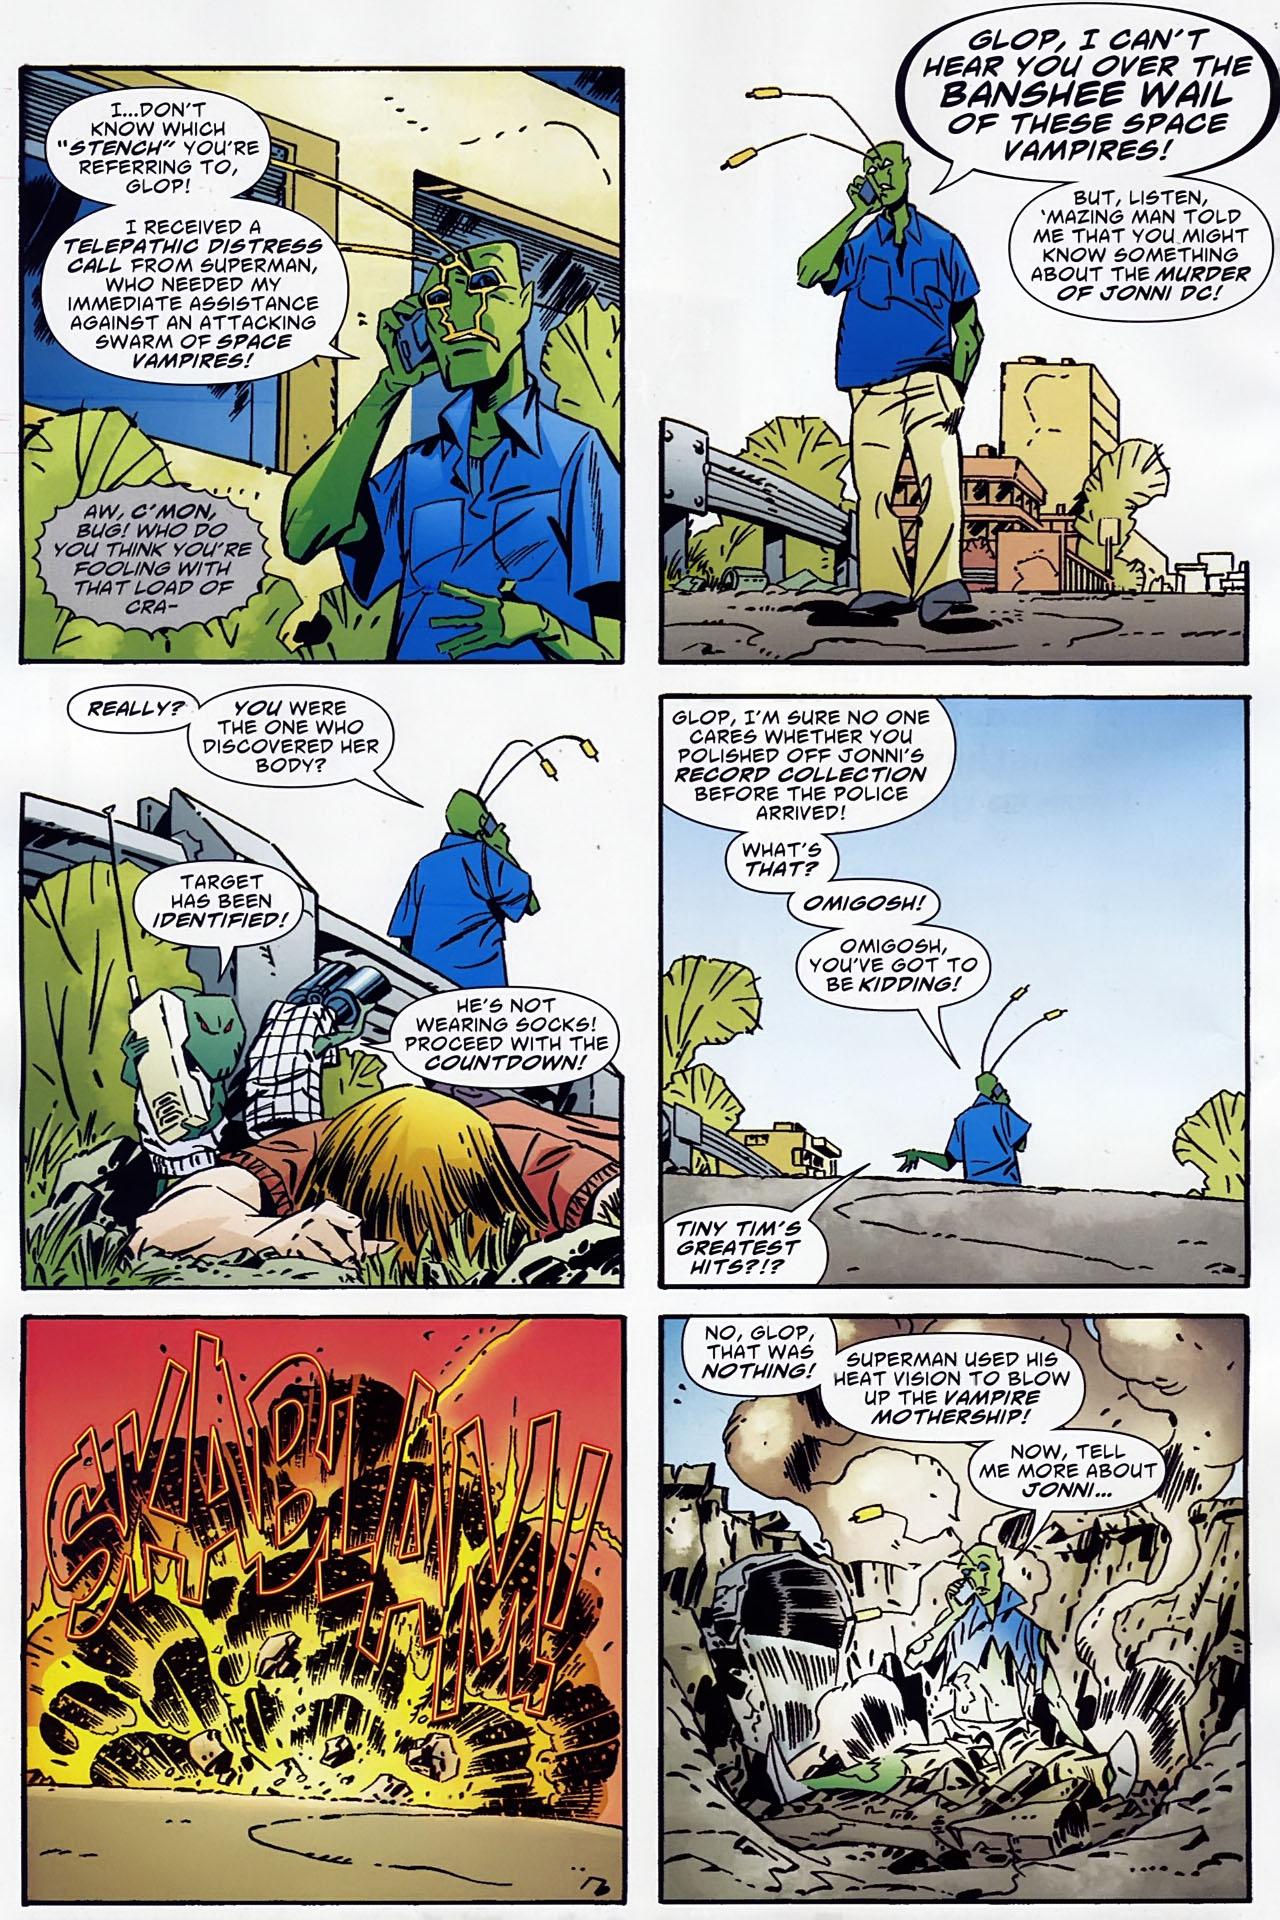 Read online Ambush Bug: Year None comic -  Issue #1 - 14